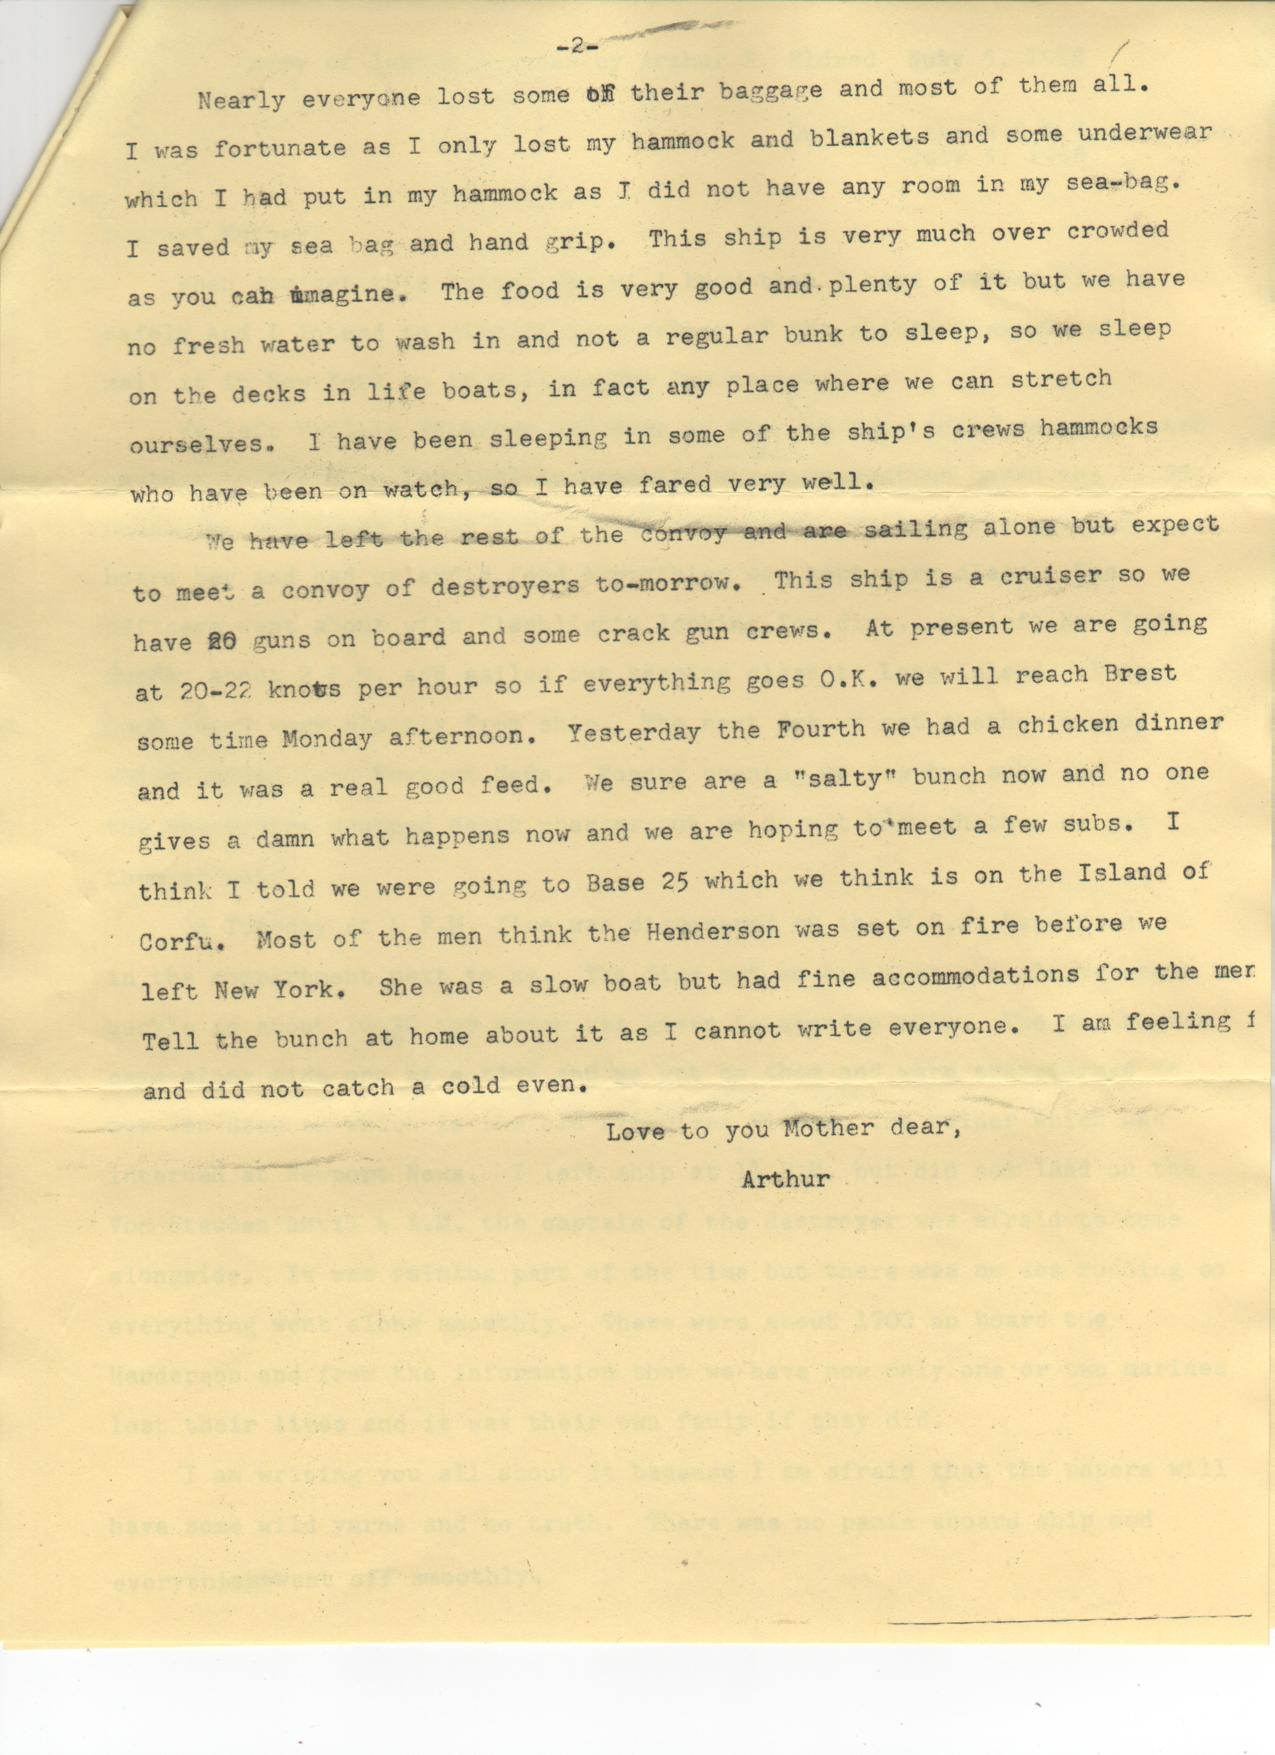 Eagle Scout Letter Of Recommendation Envelope